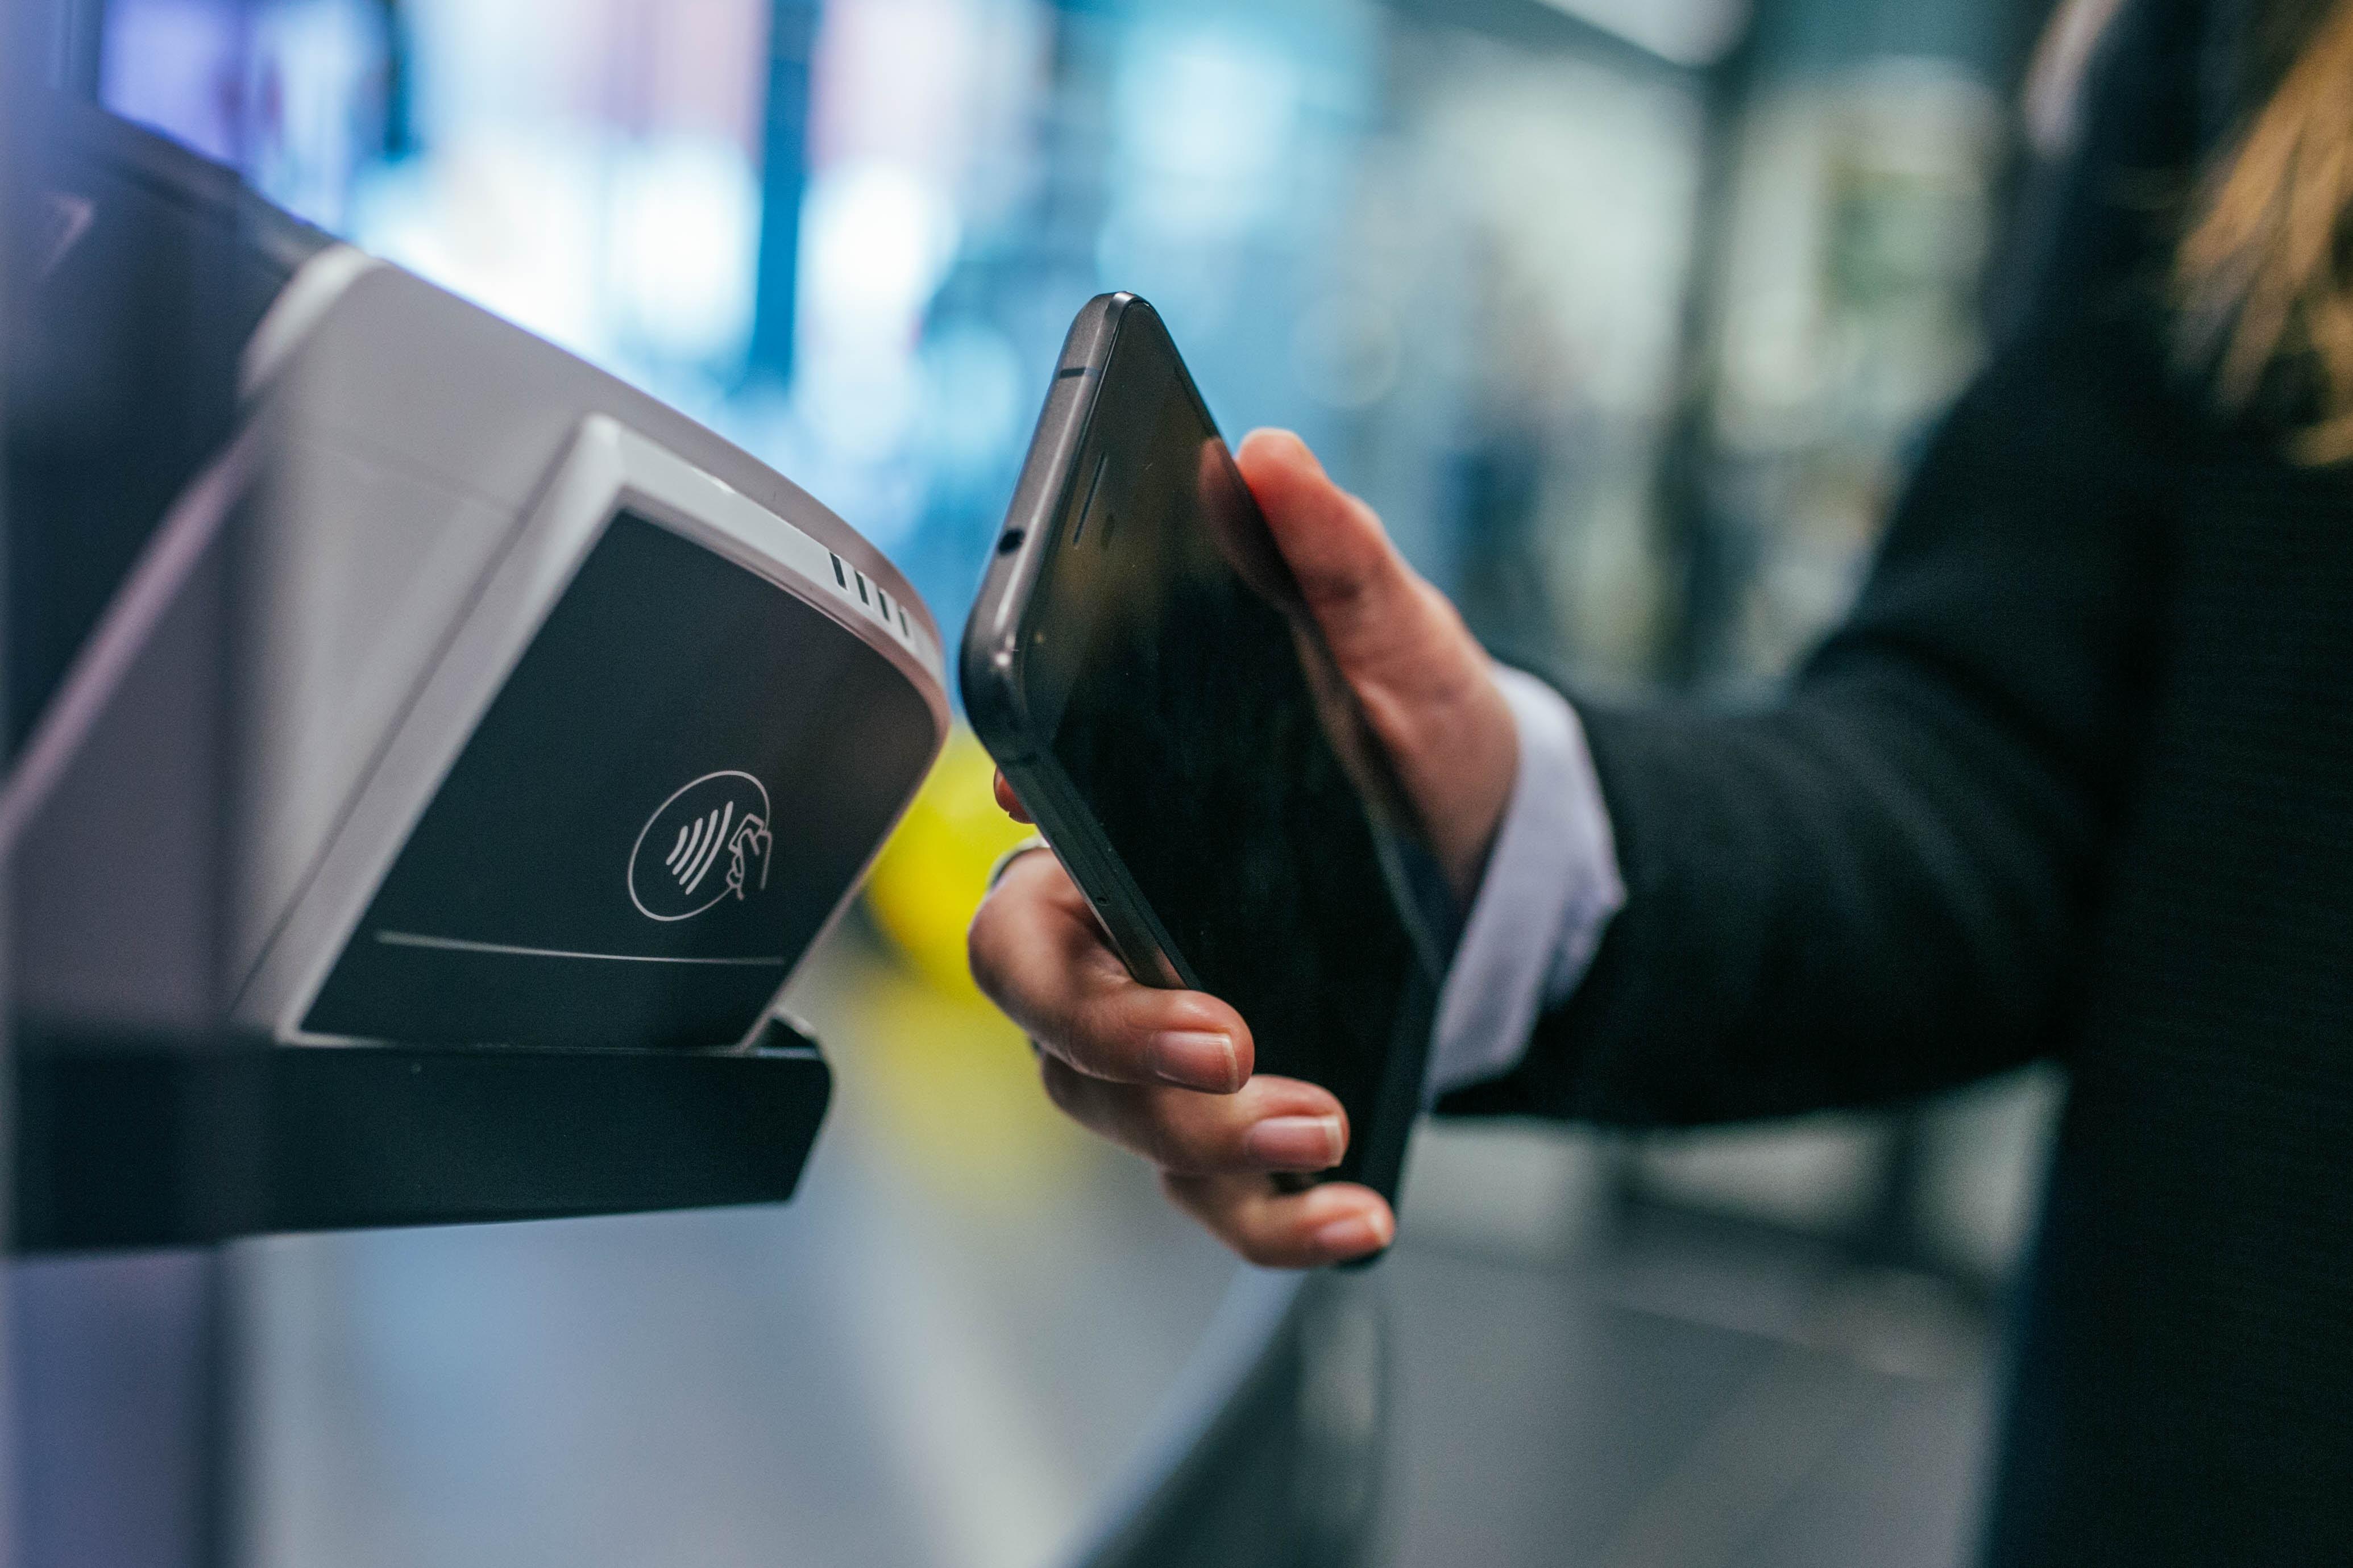 Peretvoriť svij smartfon na terminal – MasterCard anonsuje cikavynky i dilyťsja statystykoju